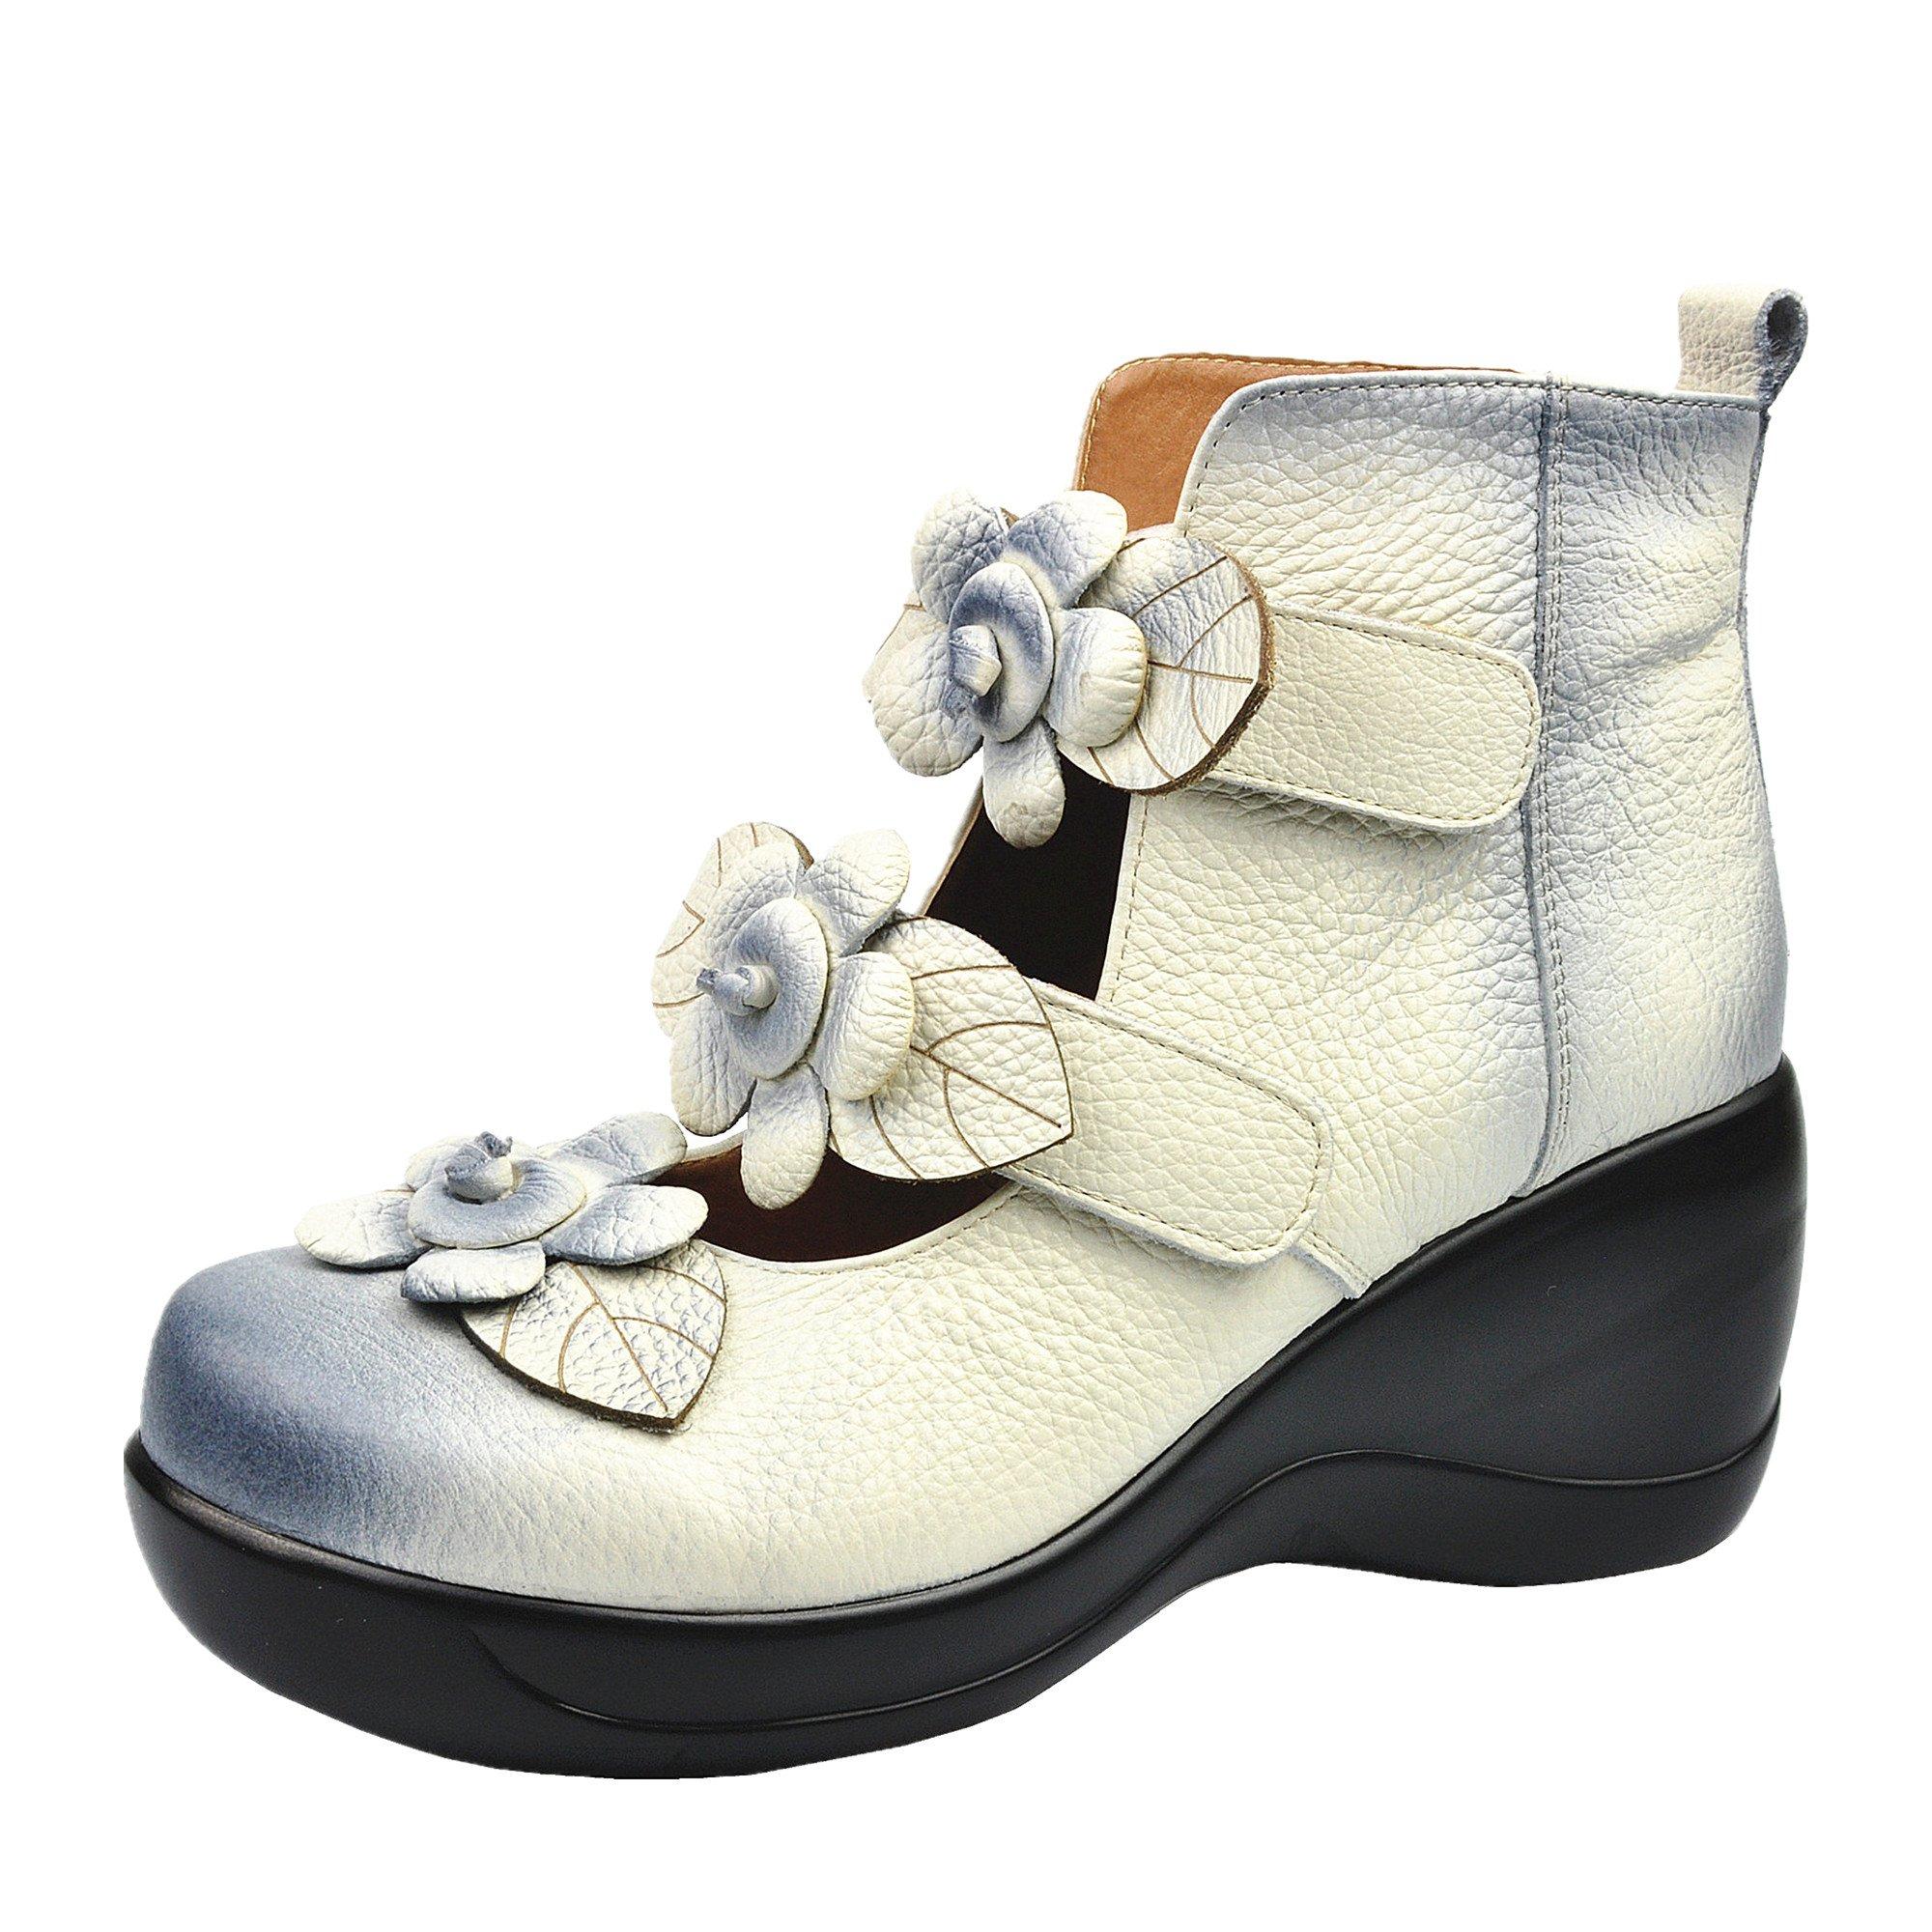 CUNZHAI Women's Unique Handmade Leather Casual Travel Soft Bottom Boot White 7.5